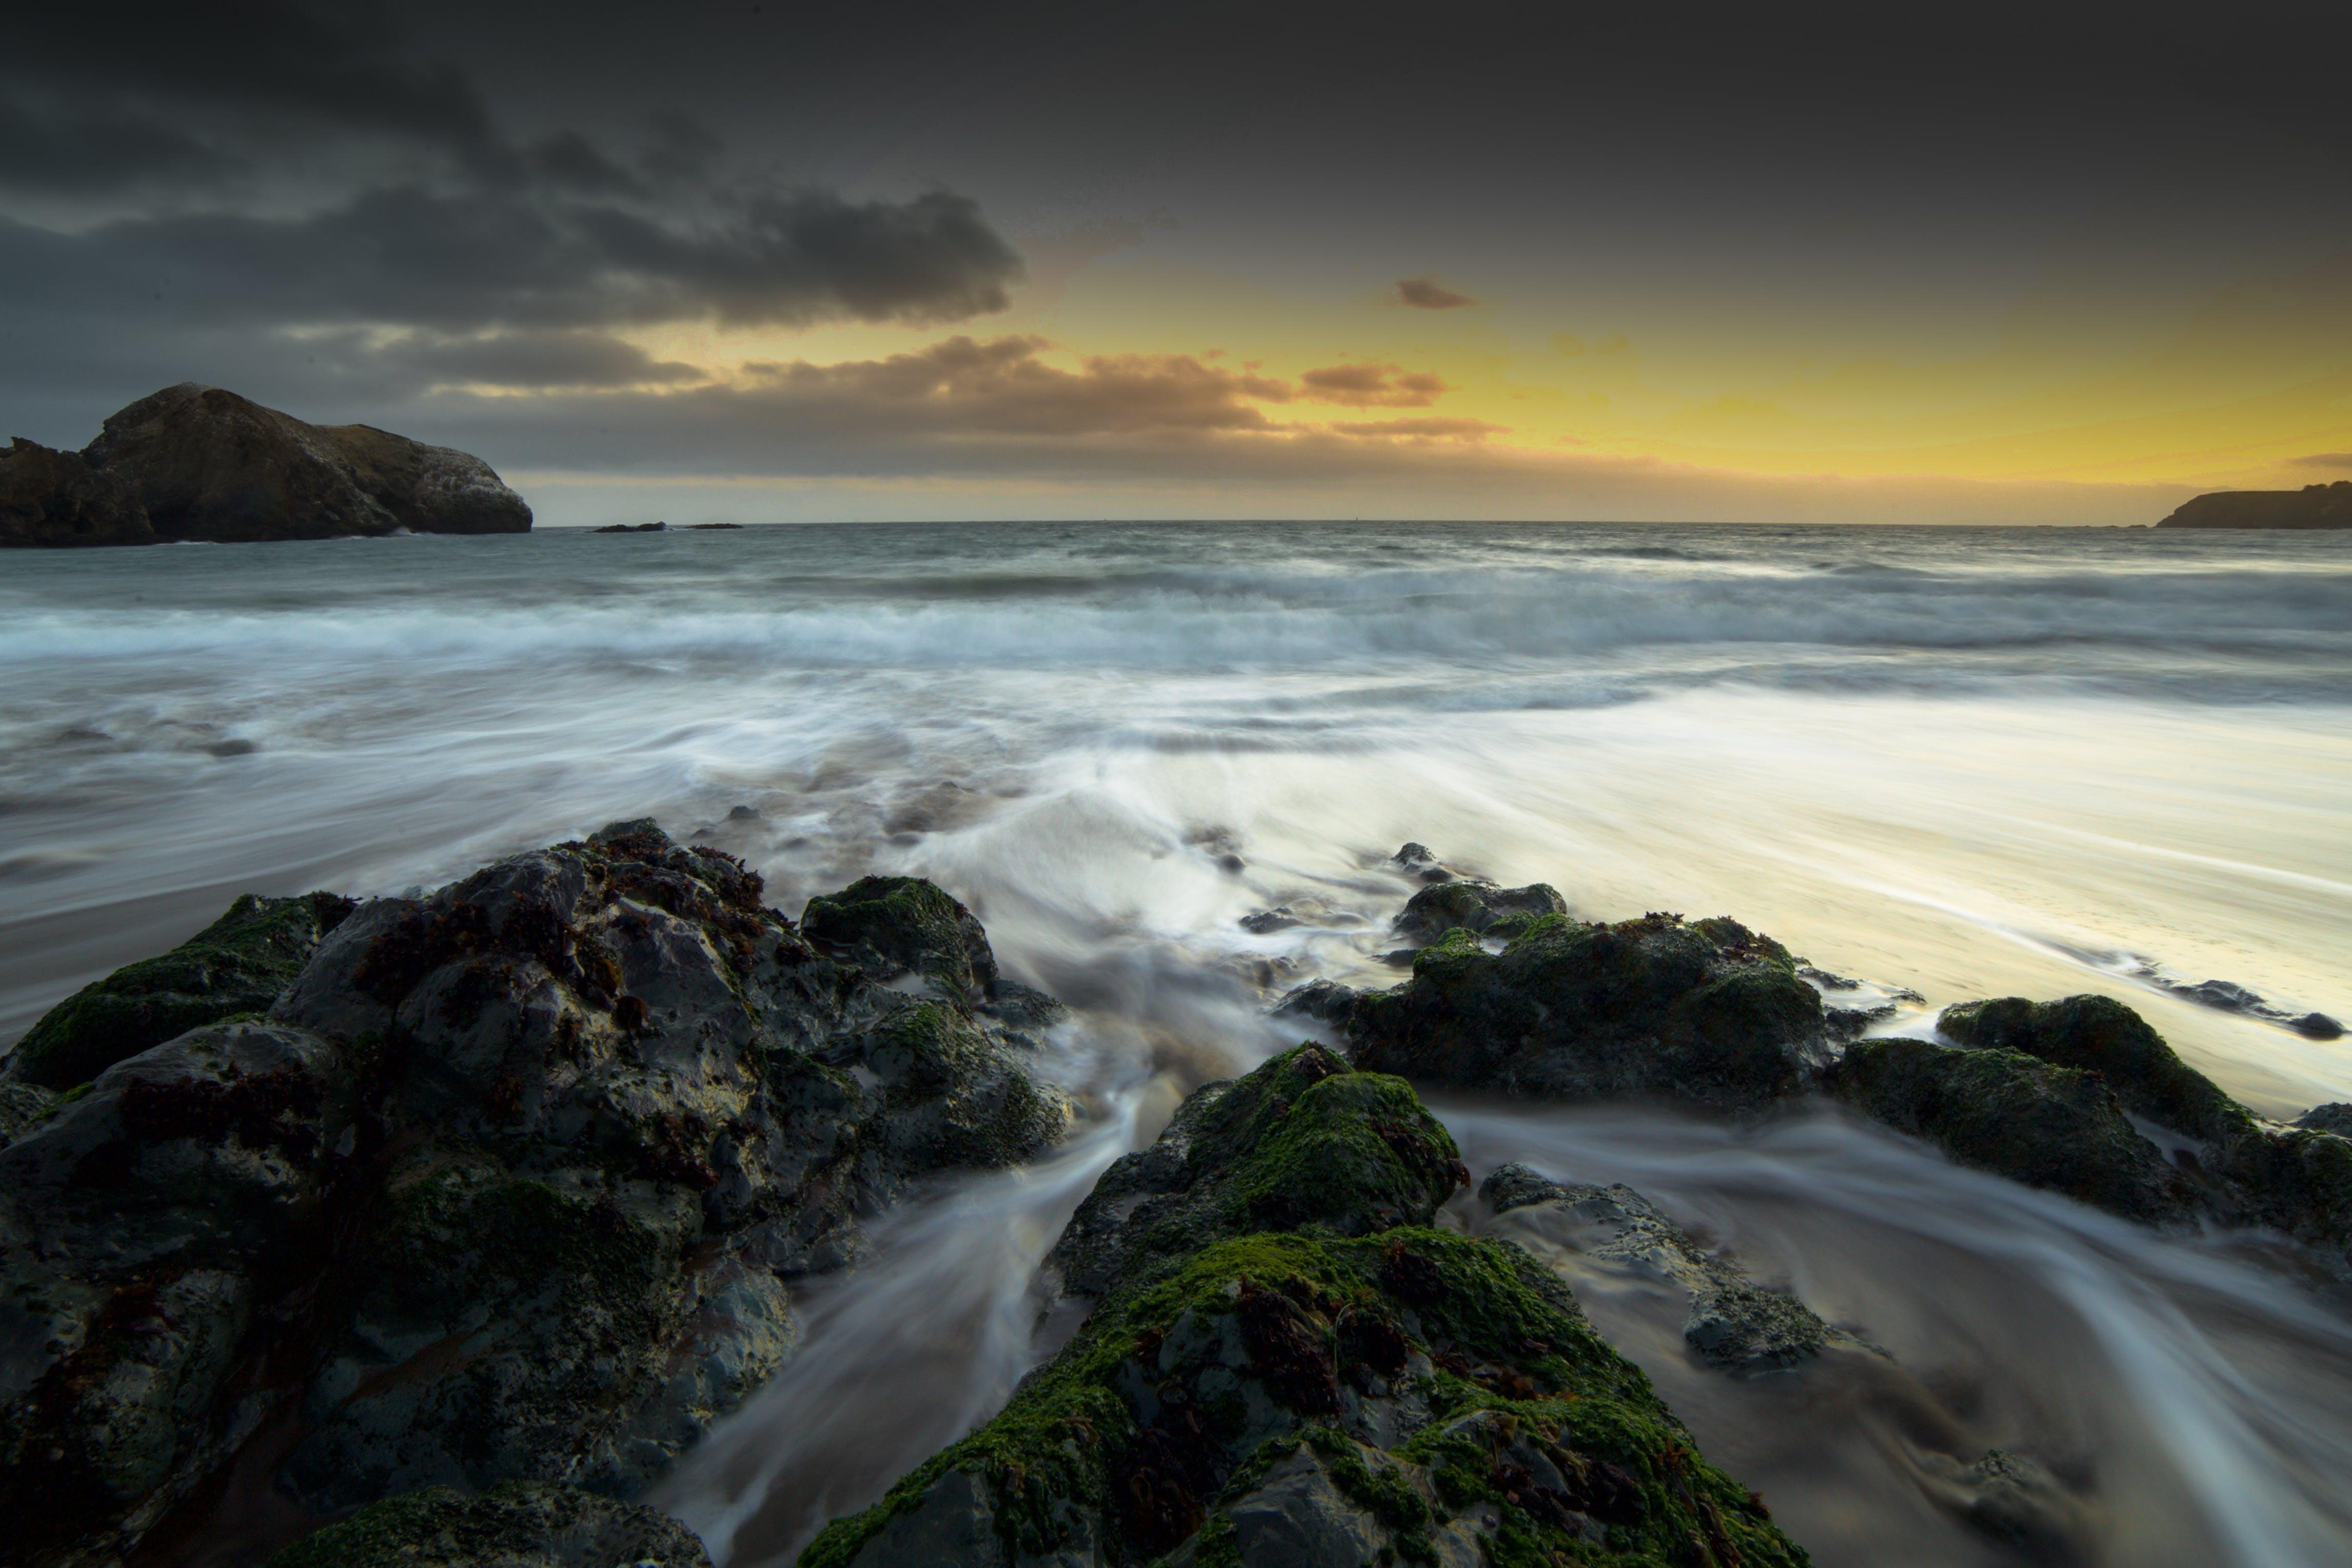 Rocks on Seashore during Golden Hour